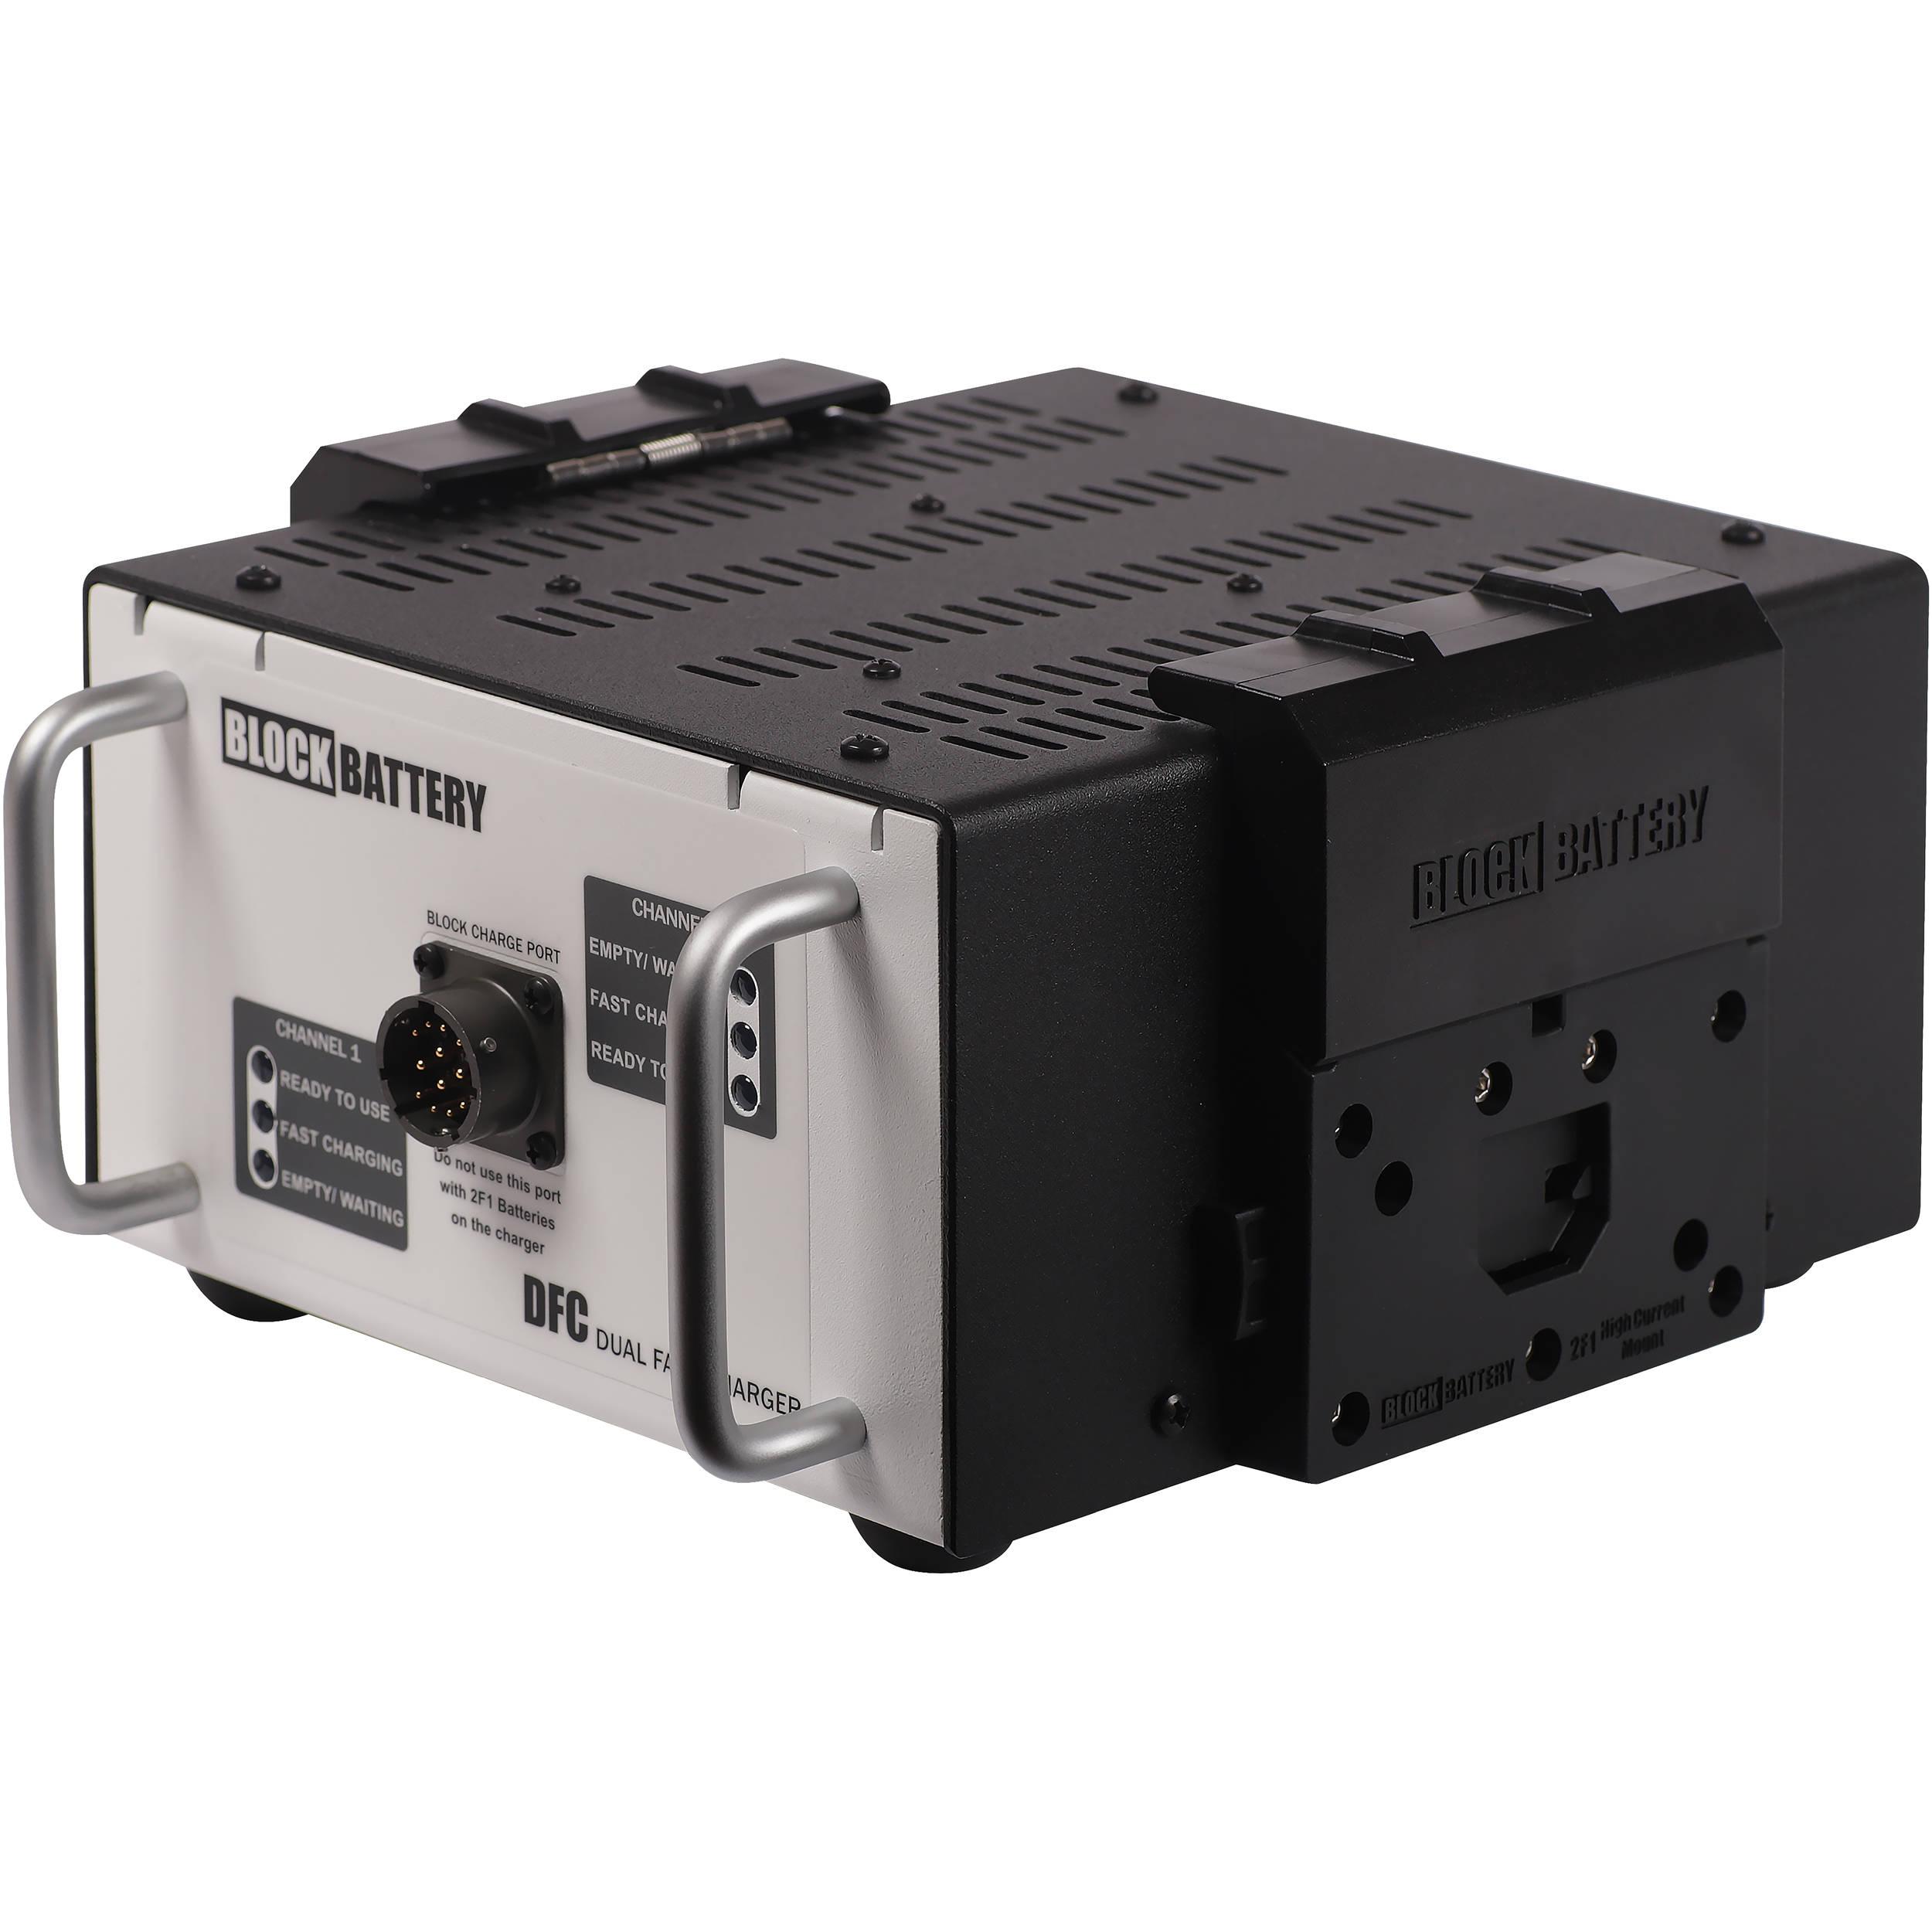 Nickel Metal Hydride Battery >> Blockbattery Dual Fast Charger For Nickel Metal Hydride Blocks And 2f1 Batteries